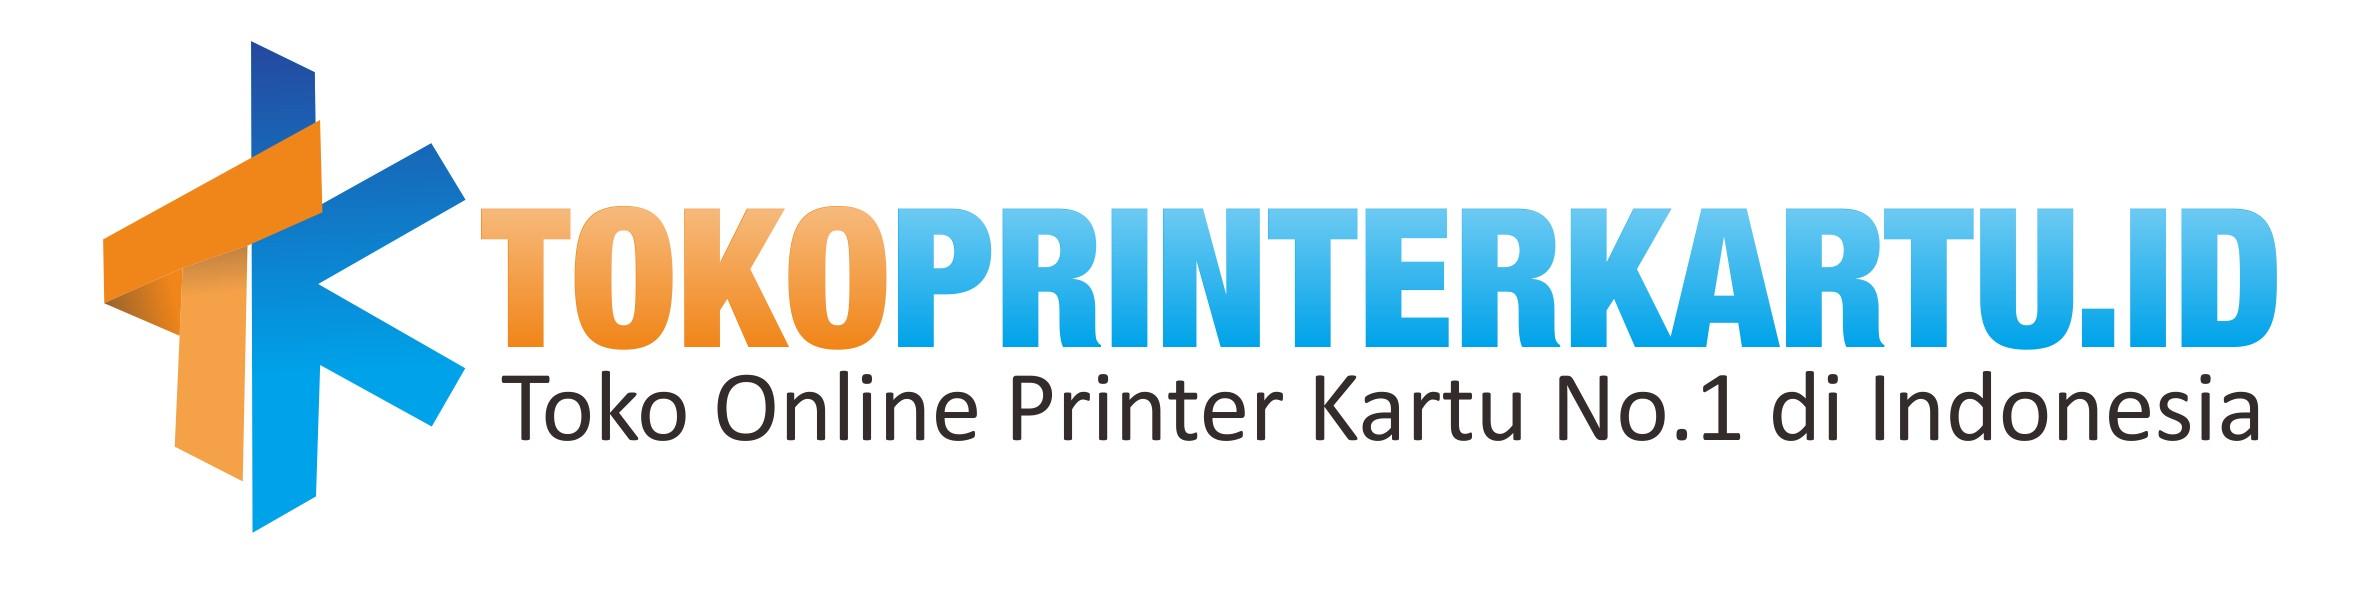 Toko Printer Kartu